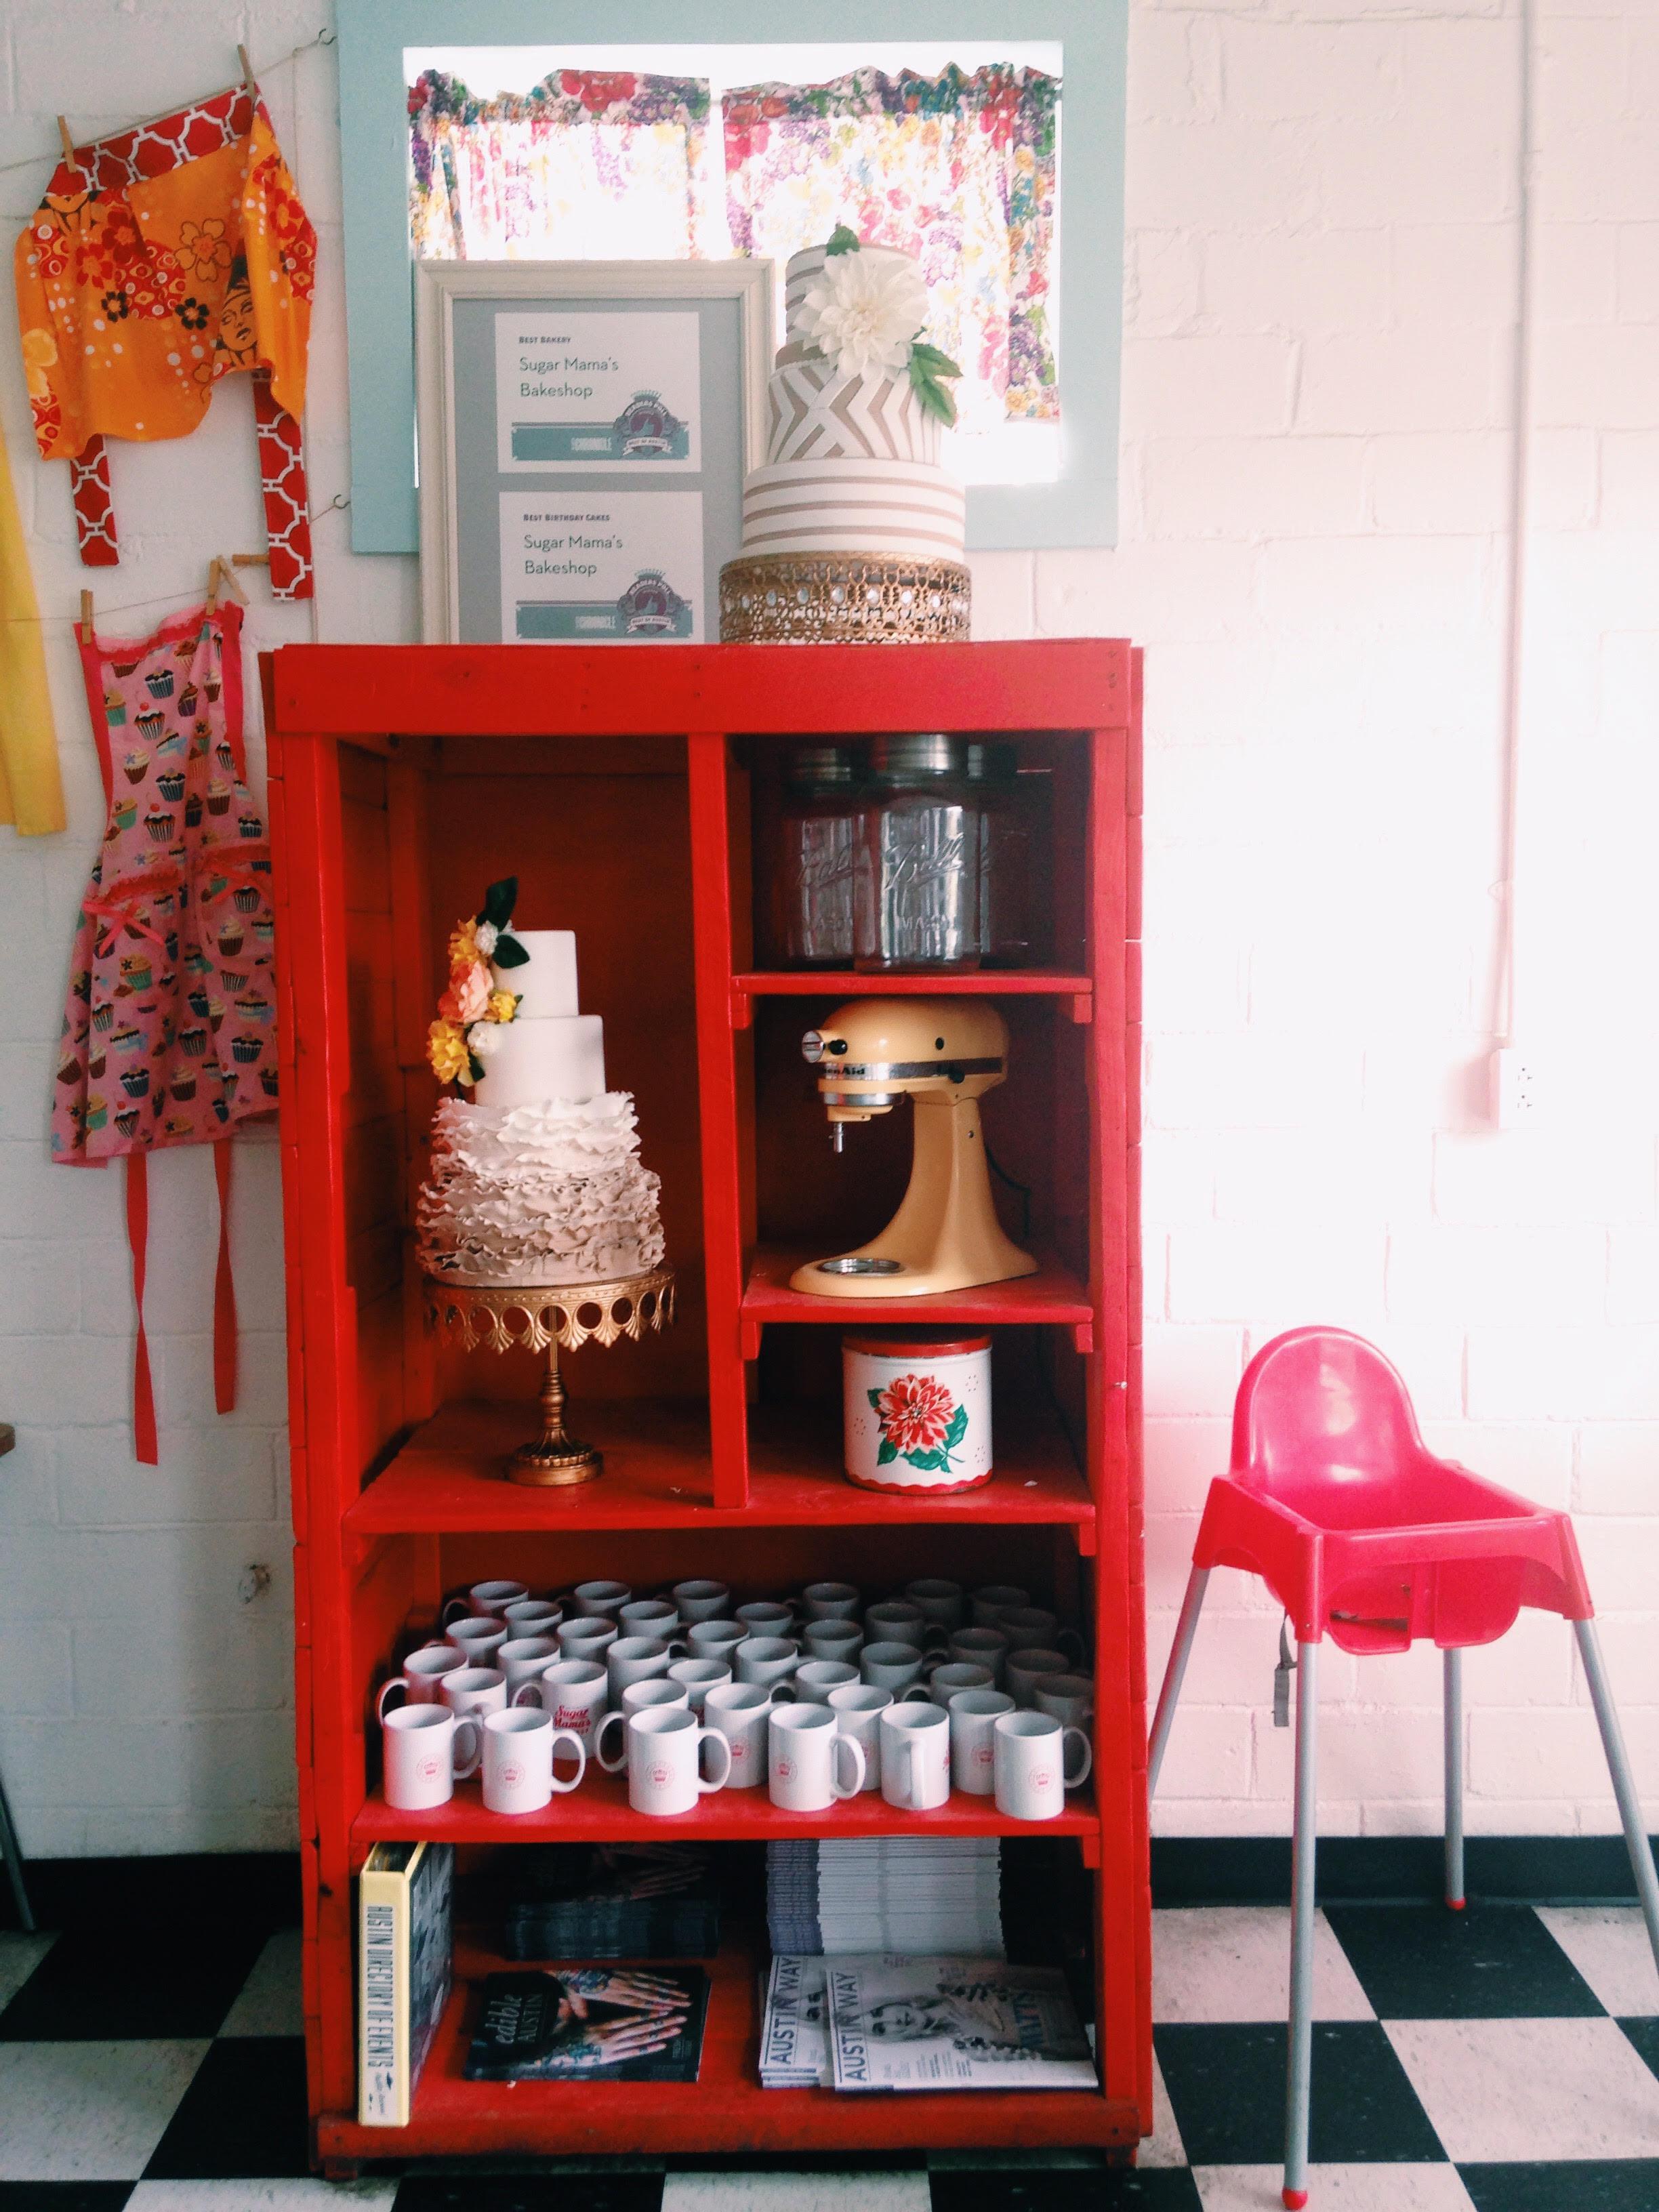 Sugar Mama's Bakeshop in Austin.